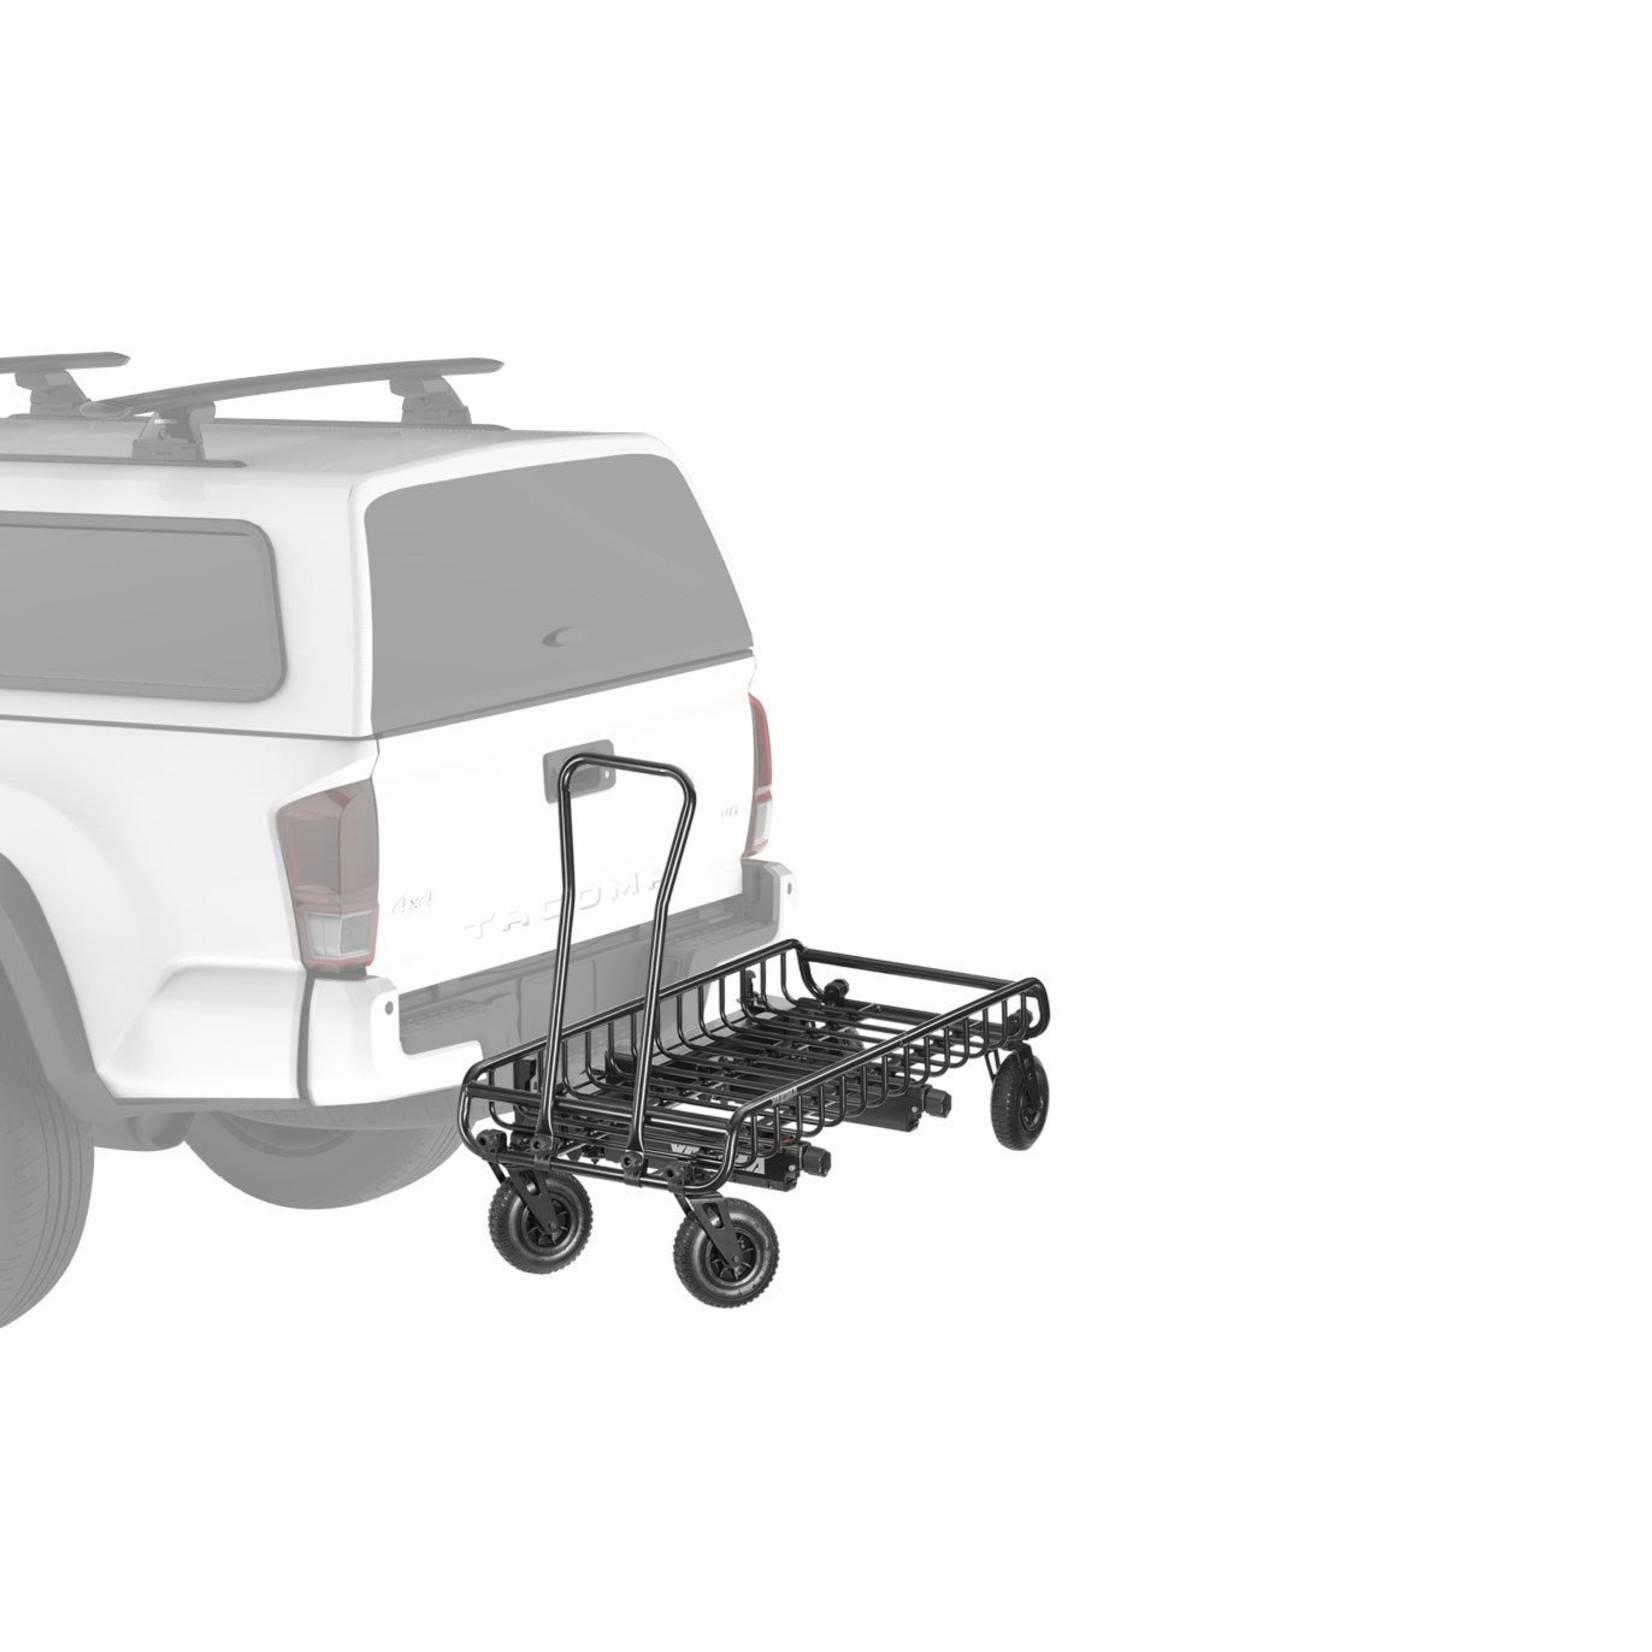 Yakima Yakima EXO WarriorWheels (GearWarrior Cart Kit)